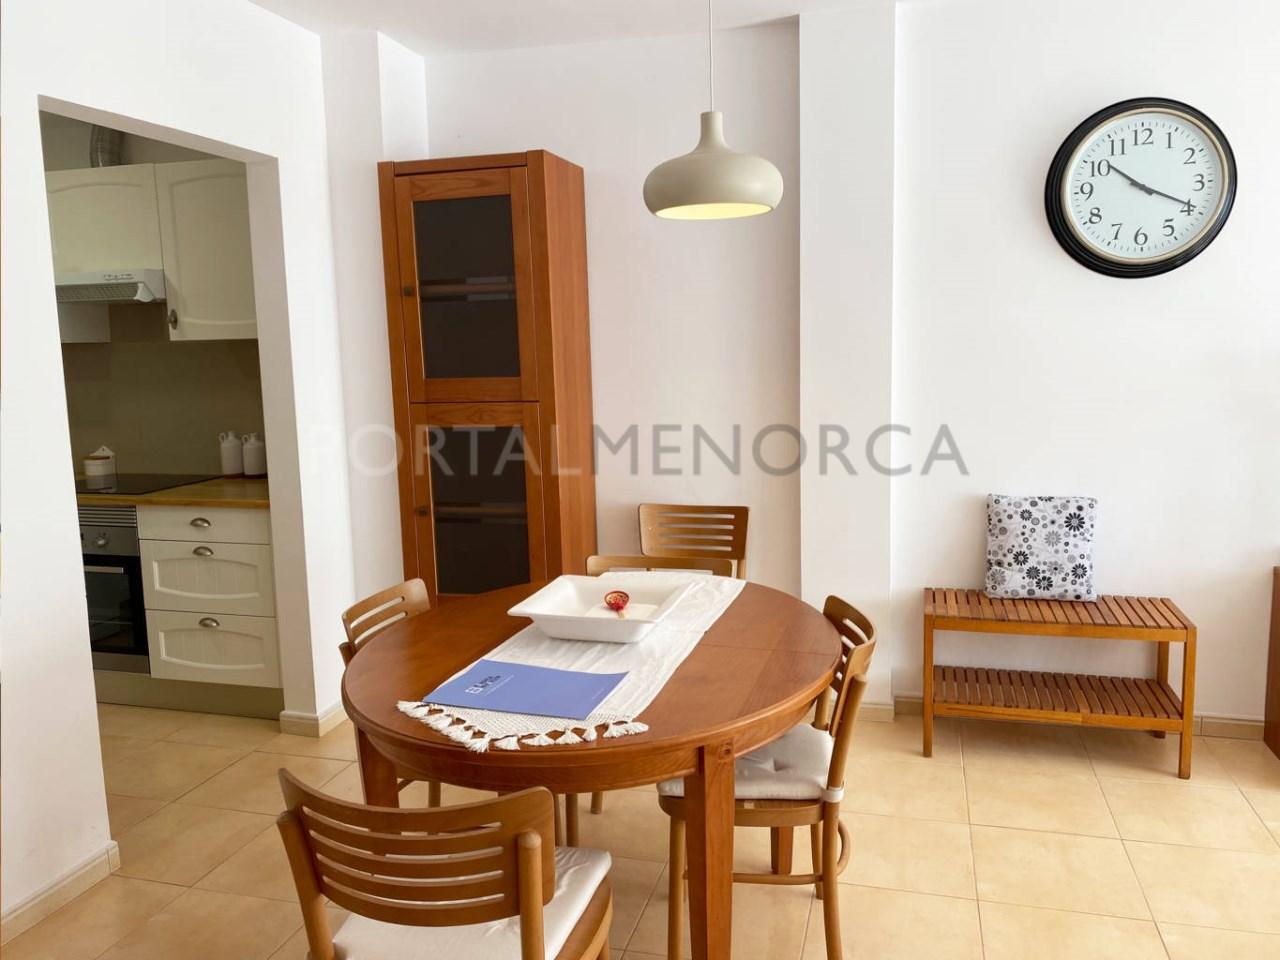 Ground floor in Ciutadella_dining room